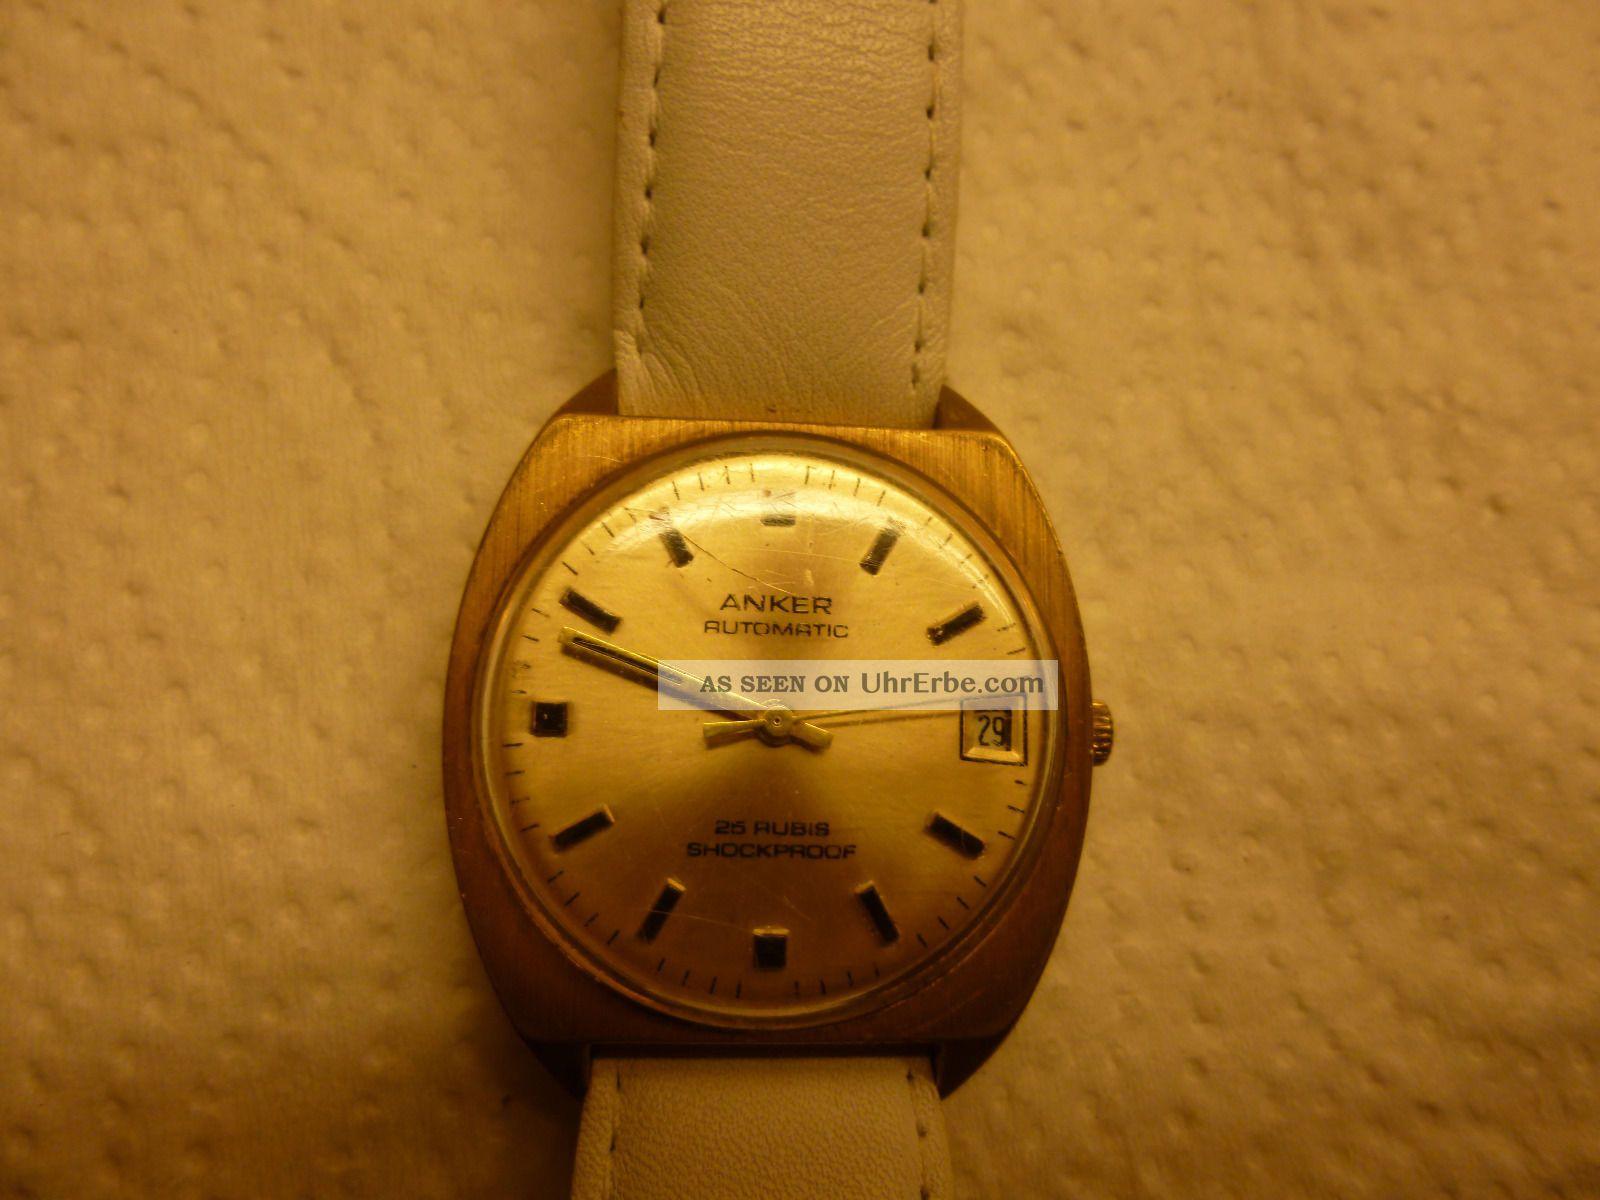 Armbanduhr Aus Papas Sammlung Nr.  22 Anker Autom 25 Rubis Funkt Mindes 12 Std. Armbanduhren Bild